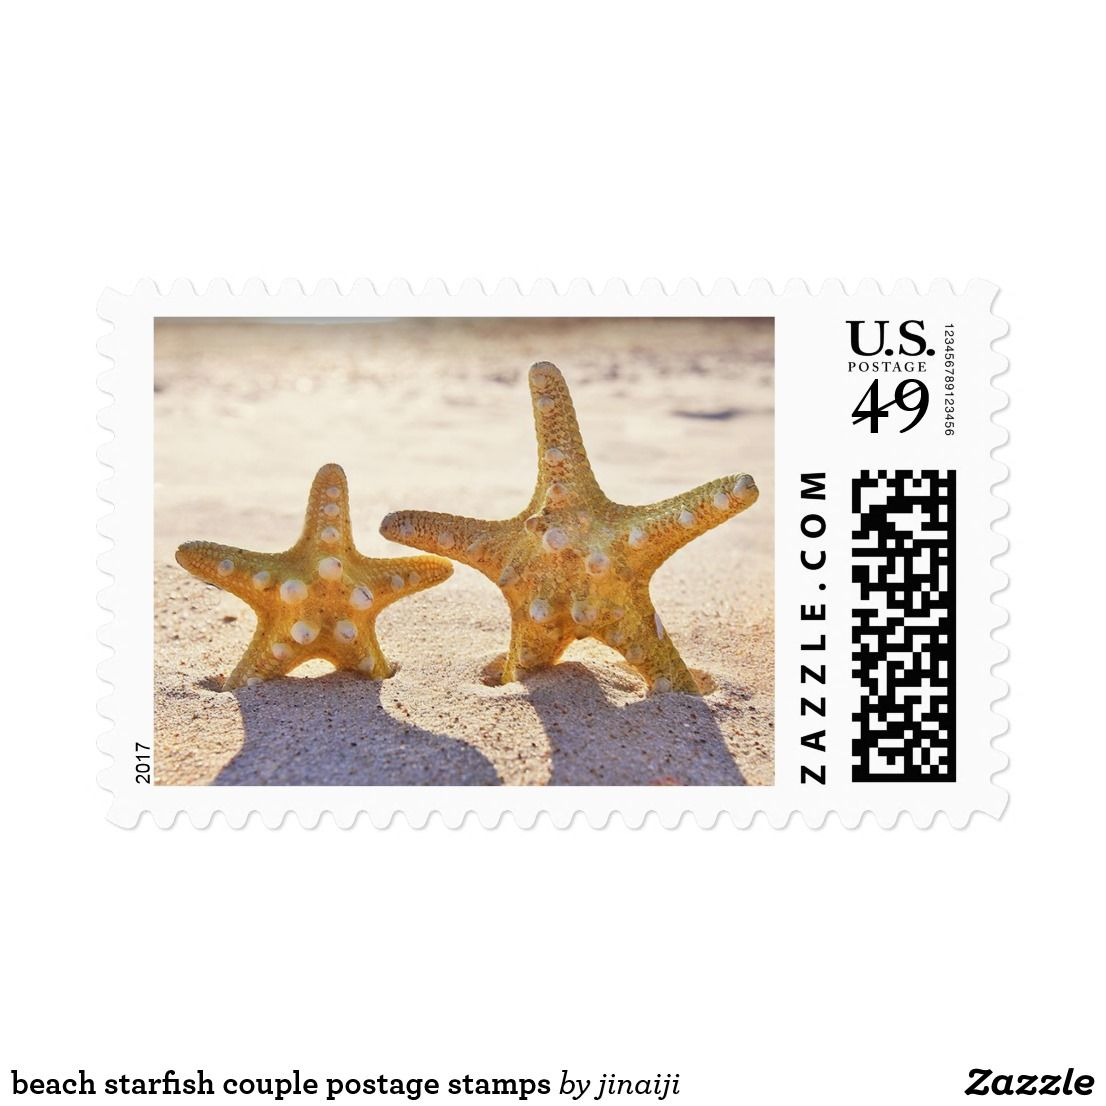 Beach starfish couple postage stamps   Wedding anniversary, Favors ...